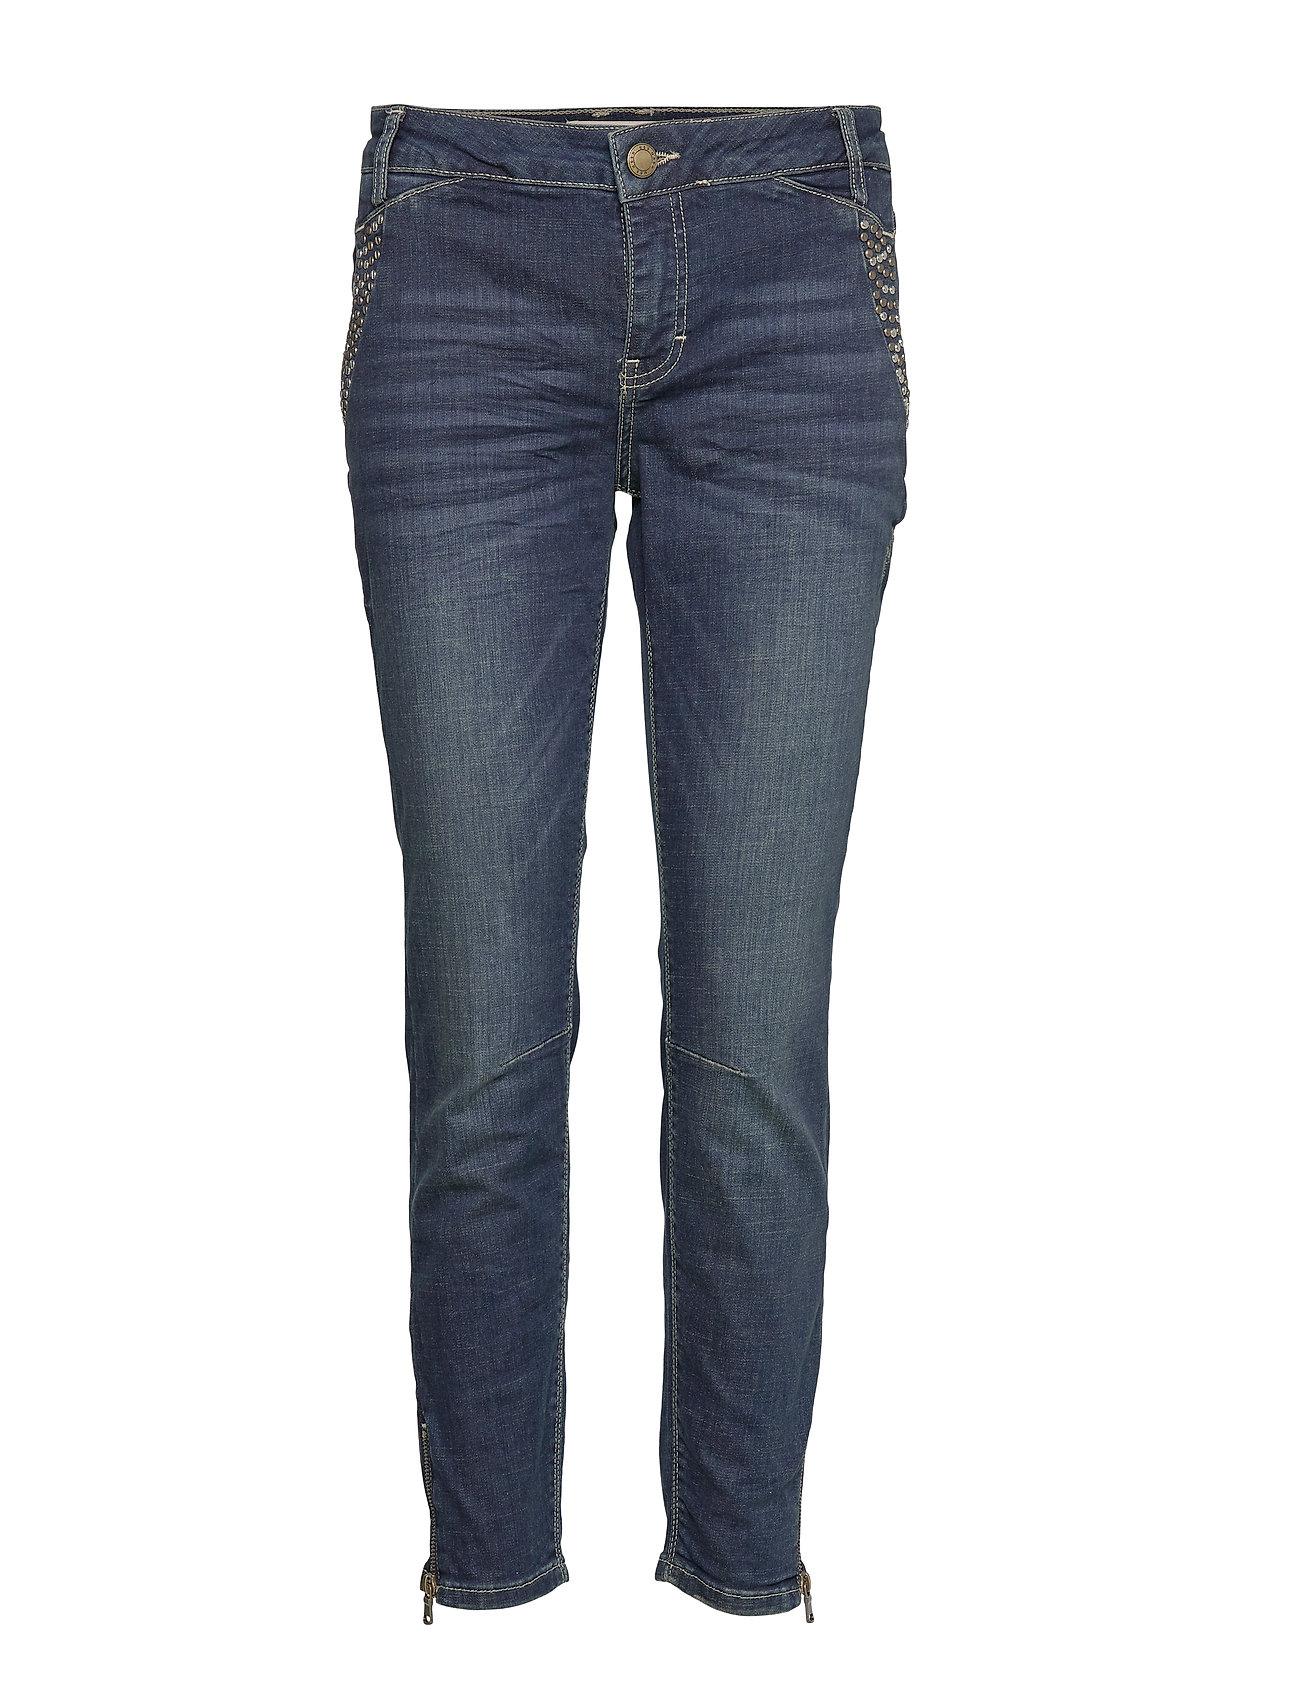 MOS MOSH Etta 7/8 Trok Jeans - DARK BLUE DENIM